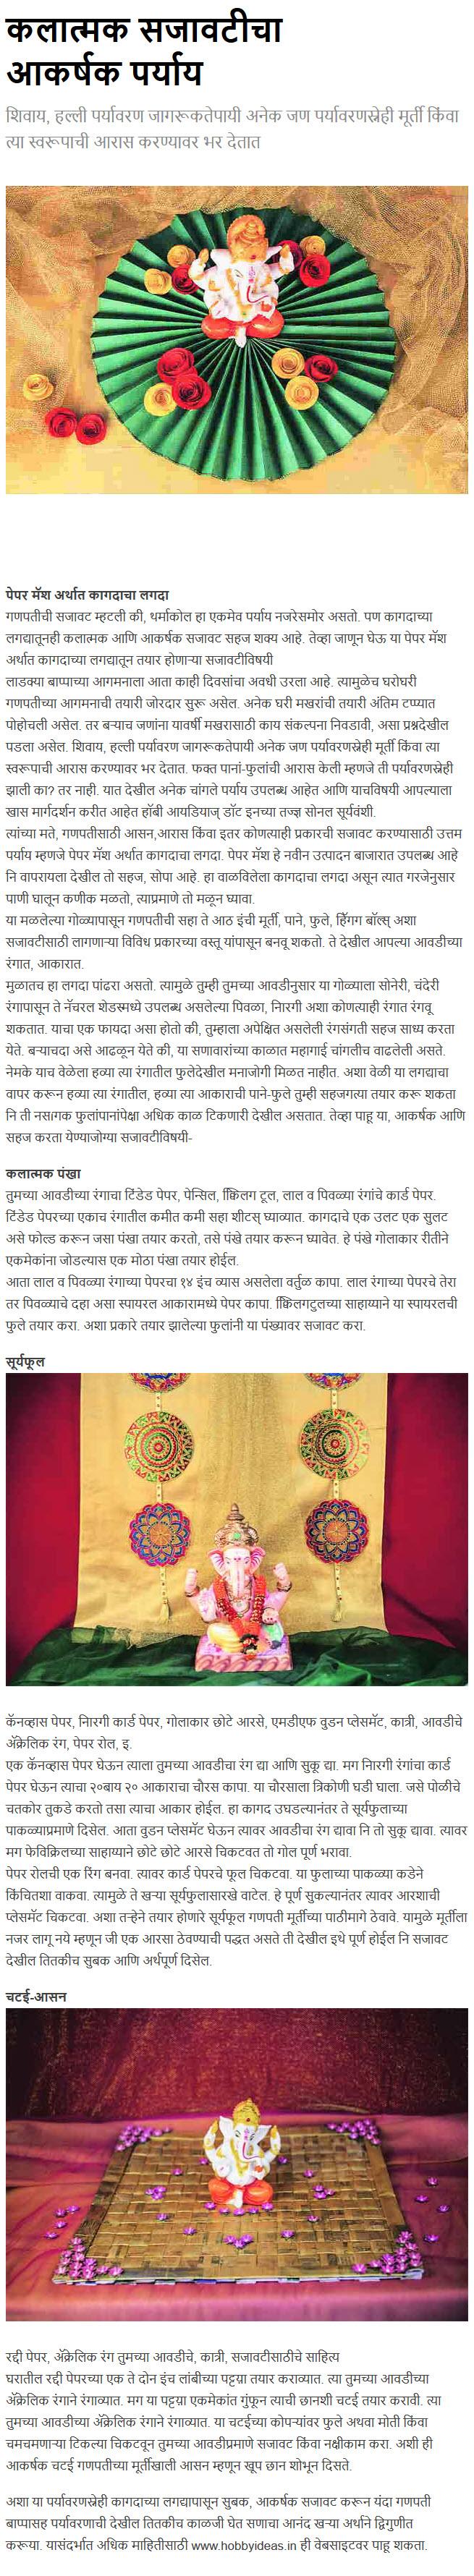 ganpati decoration ideas with papercraft